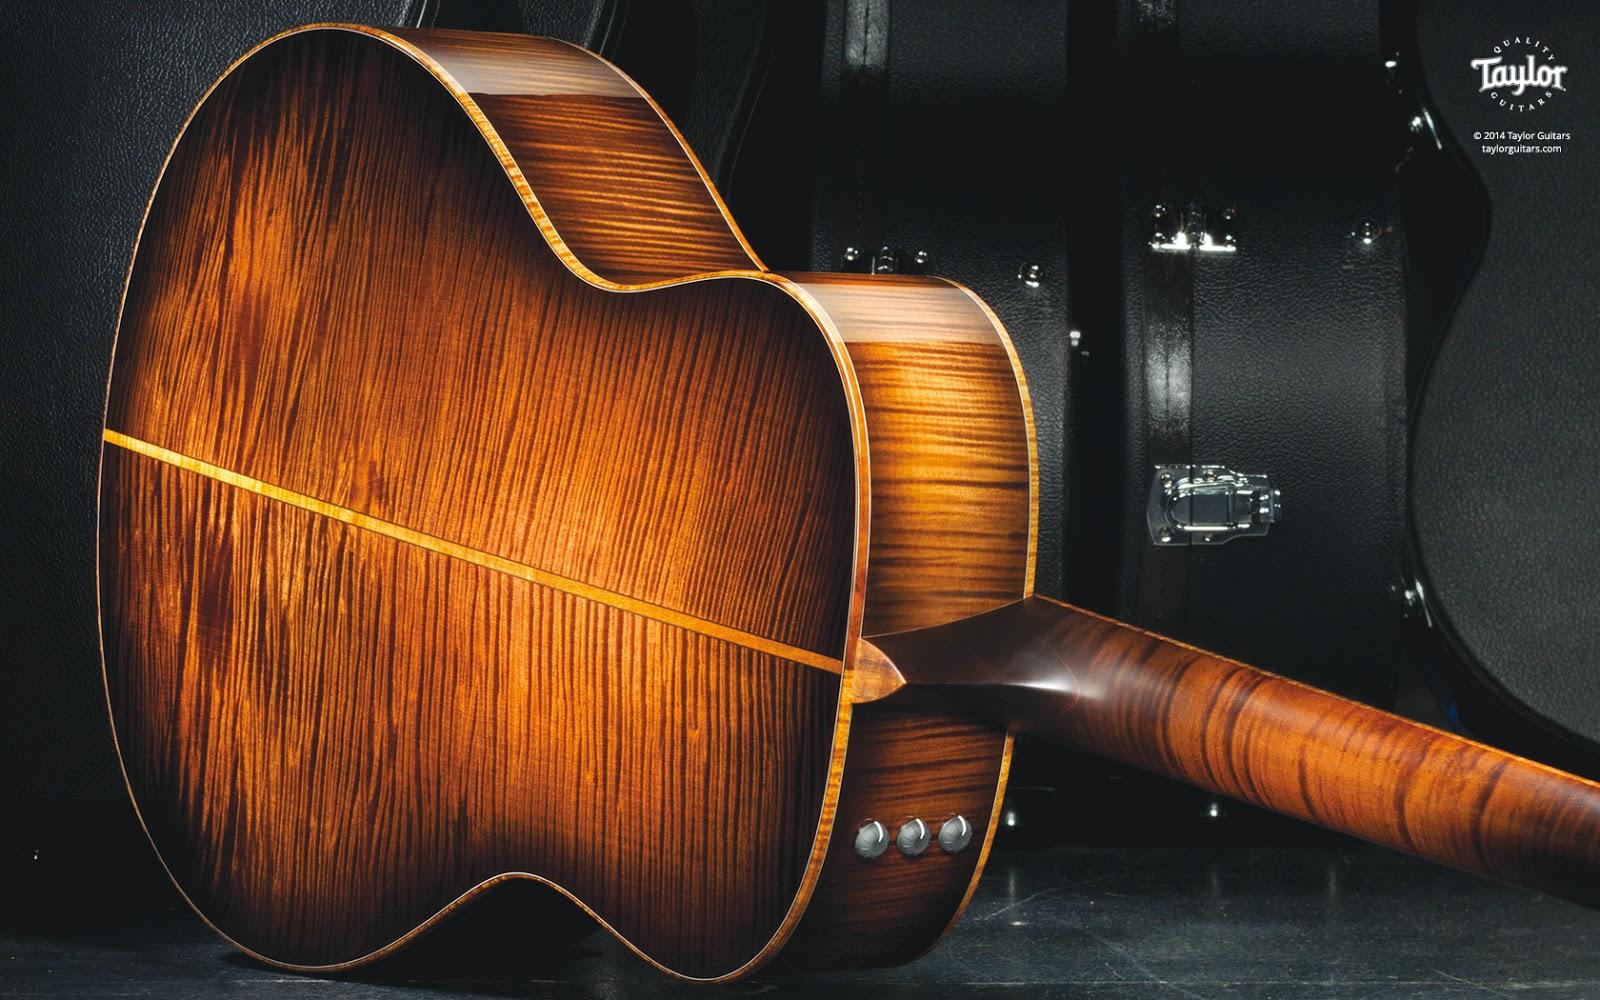 taylor guitars wallpapers - photo #14